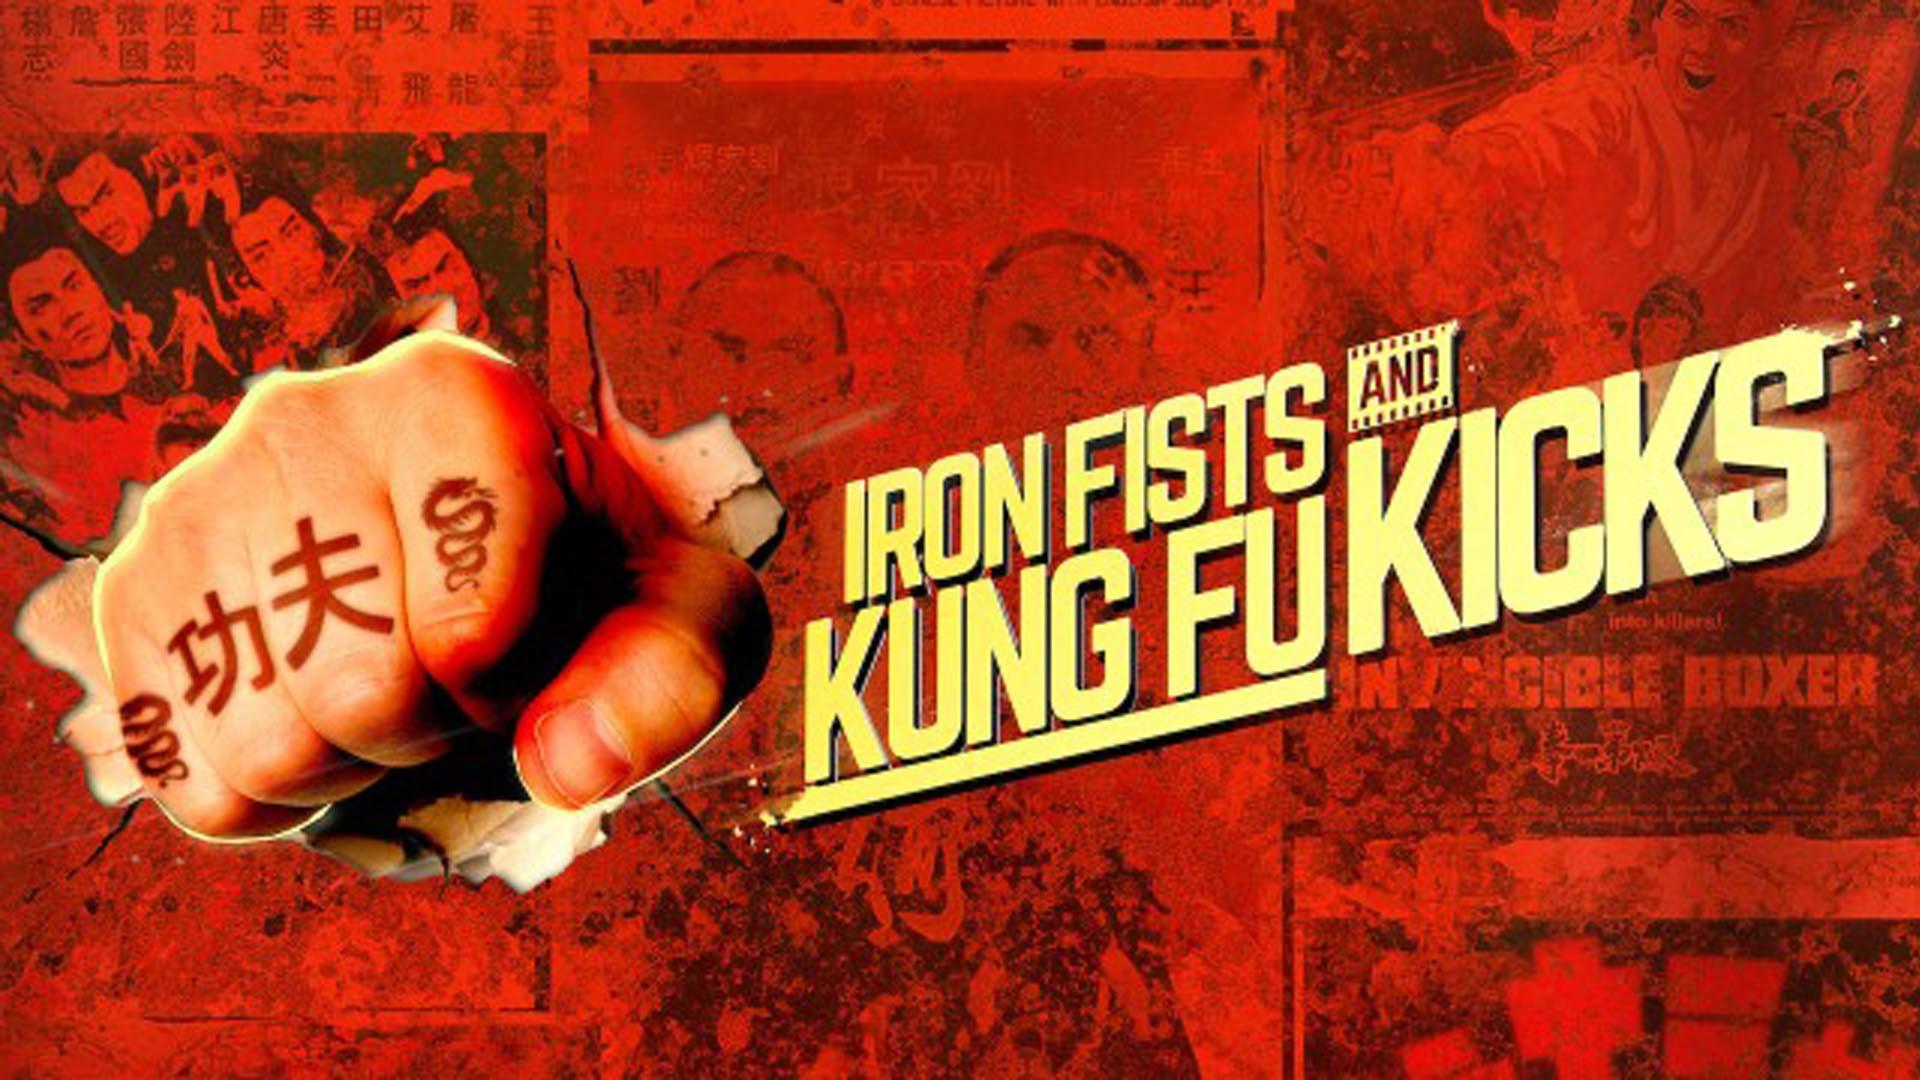 Iron_fists_and_kung_fu_kicks